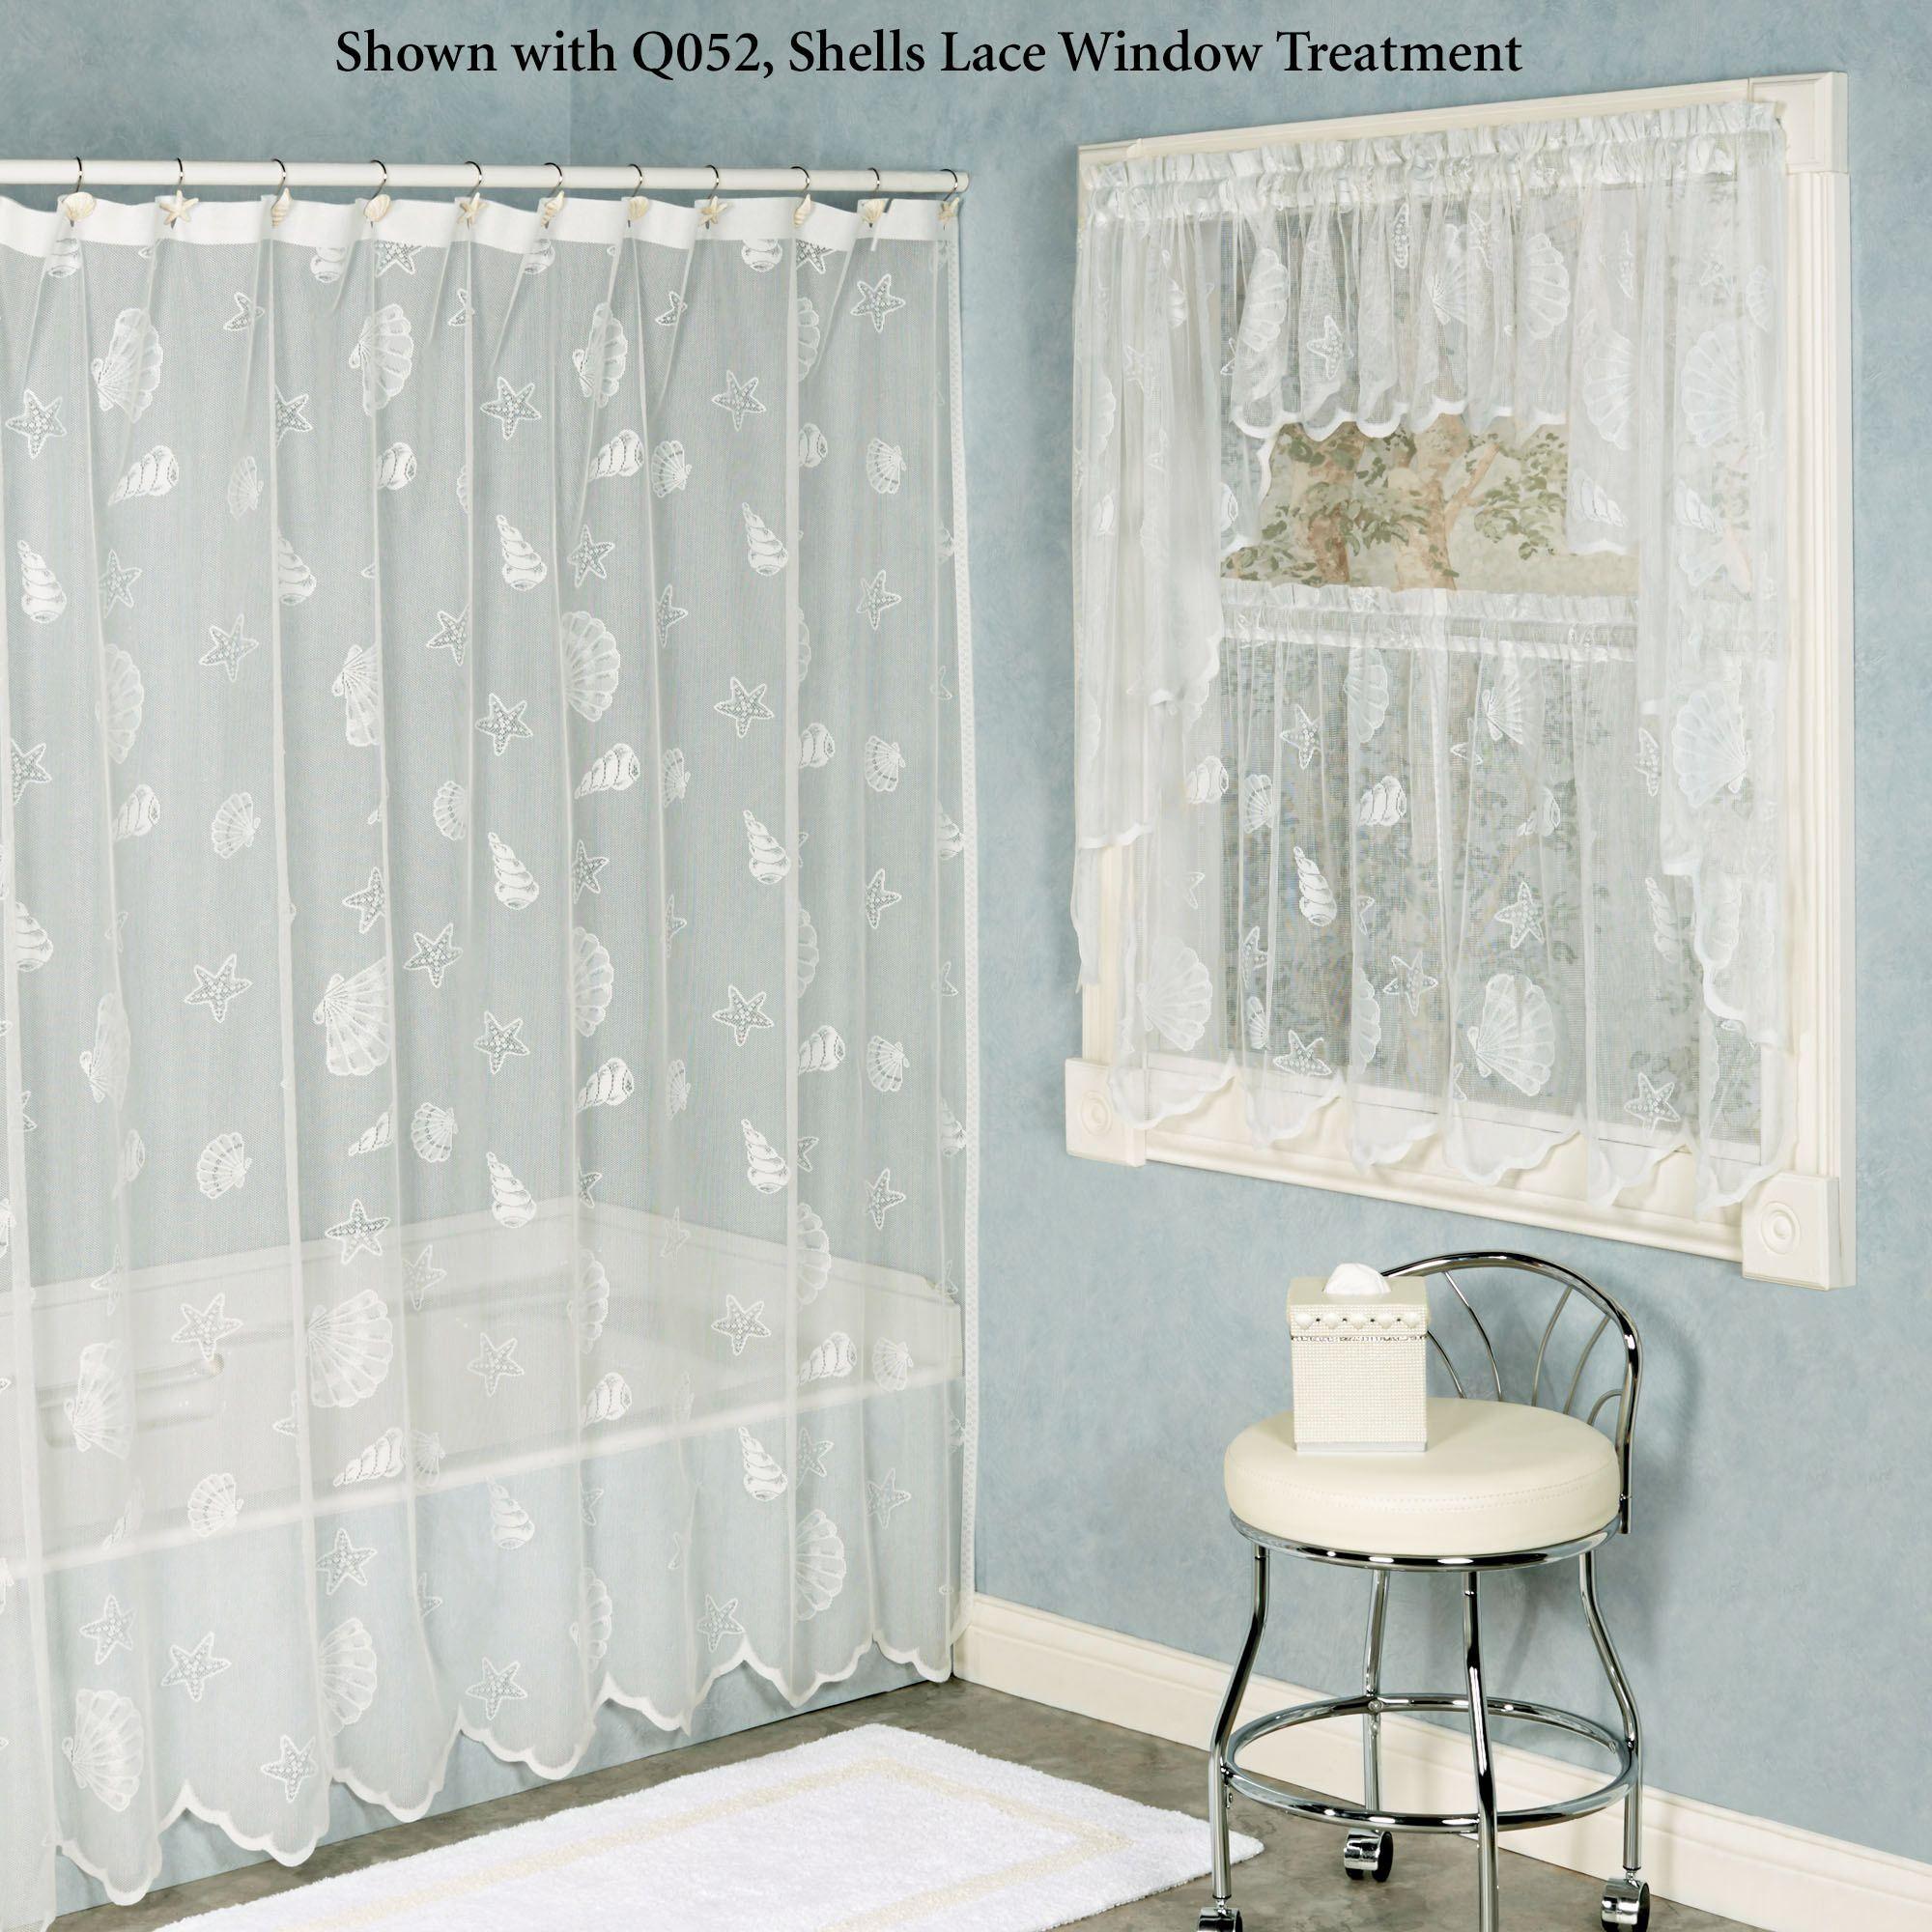 seashells lace shower curtain lace shower curtains lace shower curtains